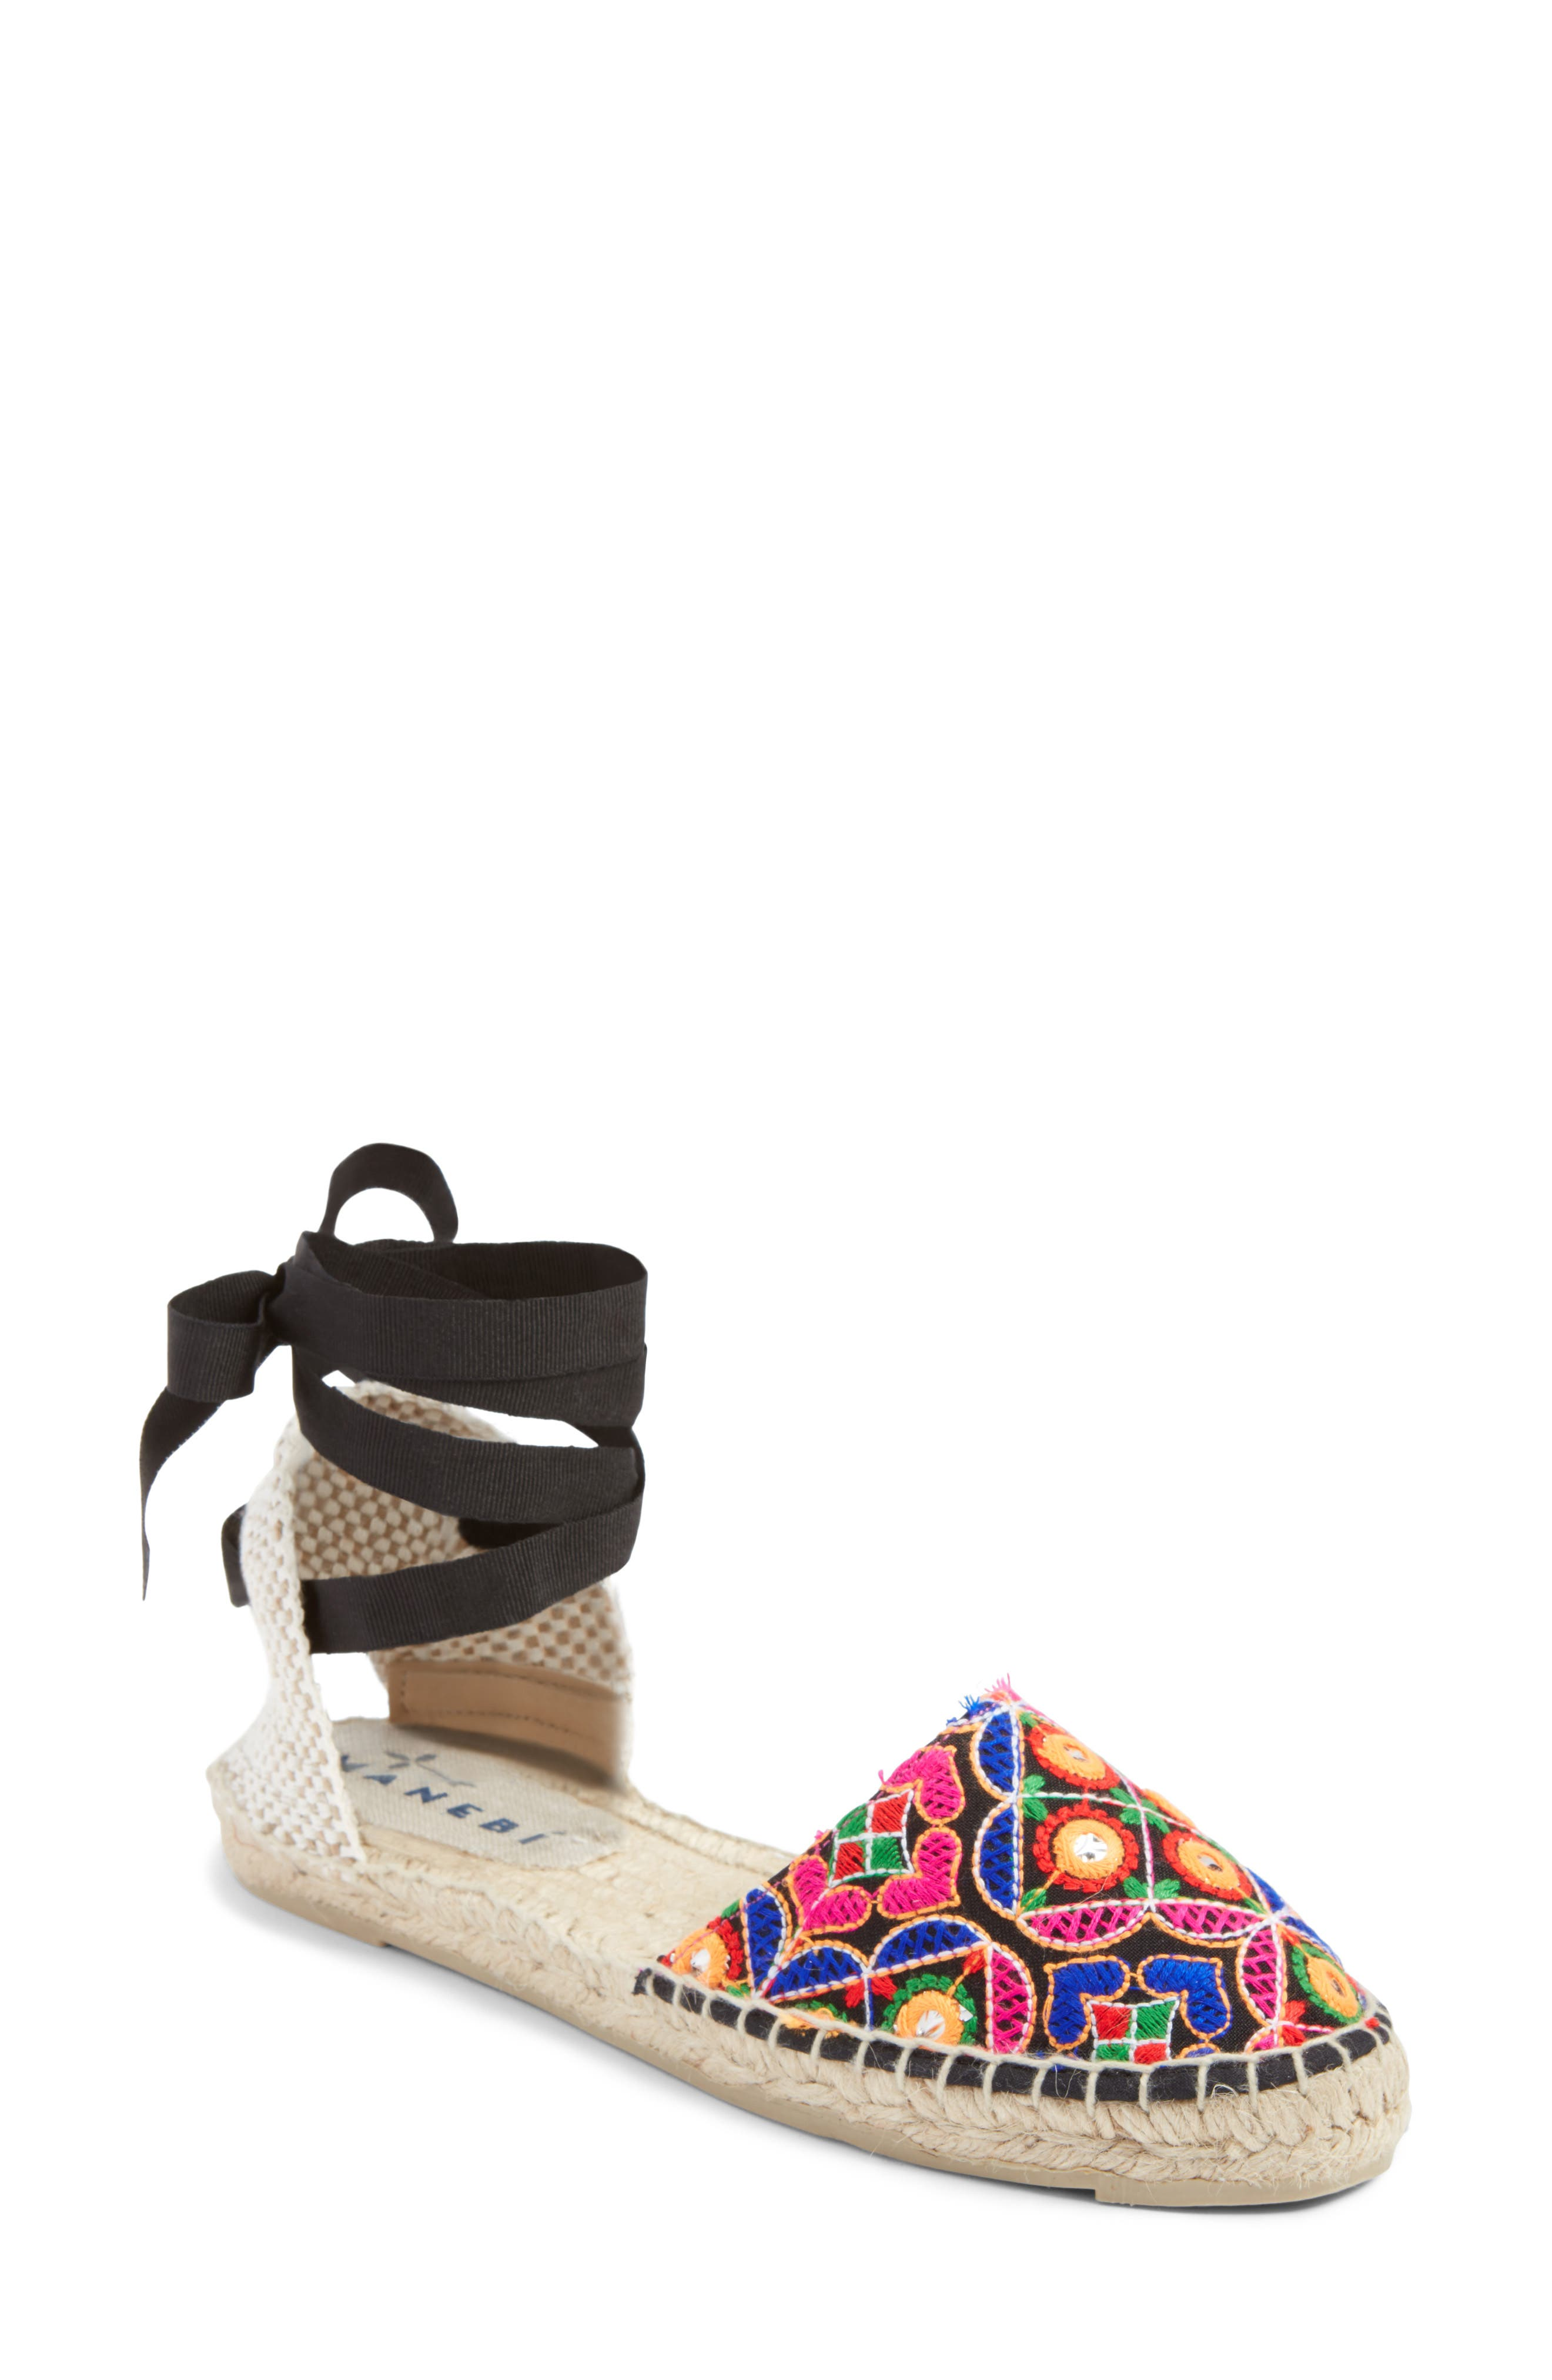 MANEBÍ Rajasthan Espadrille Sandal,                             Main thumbnail 1, color,                             Indian Fabric